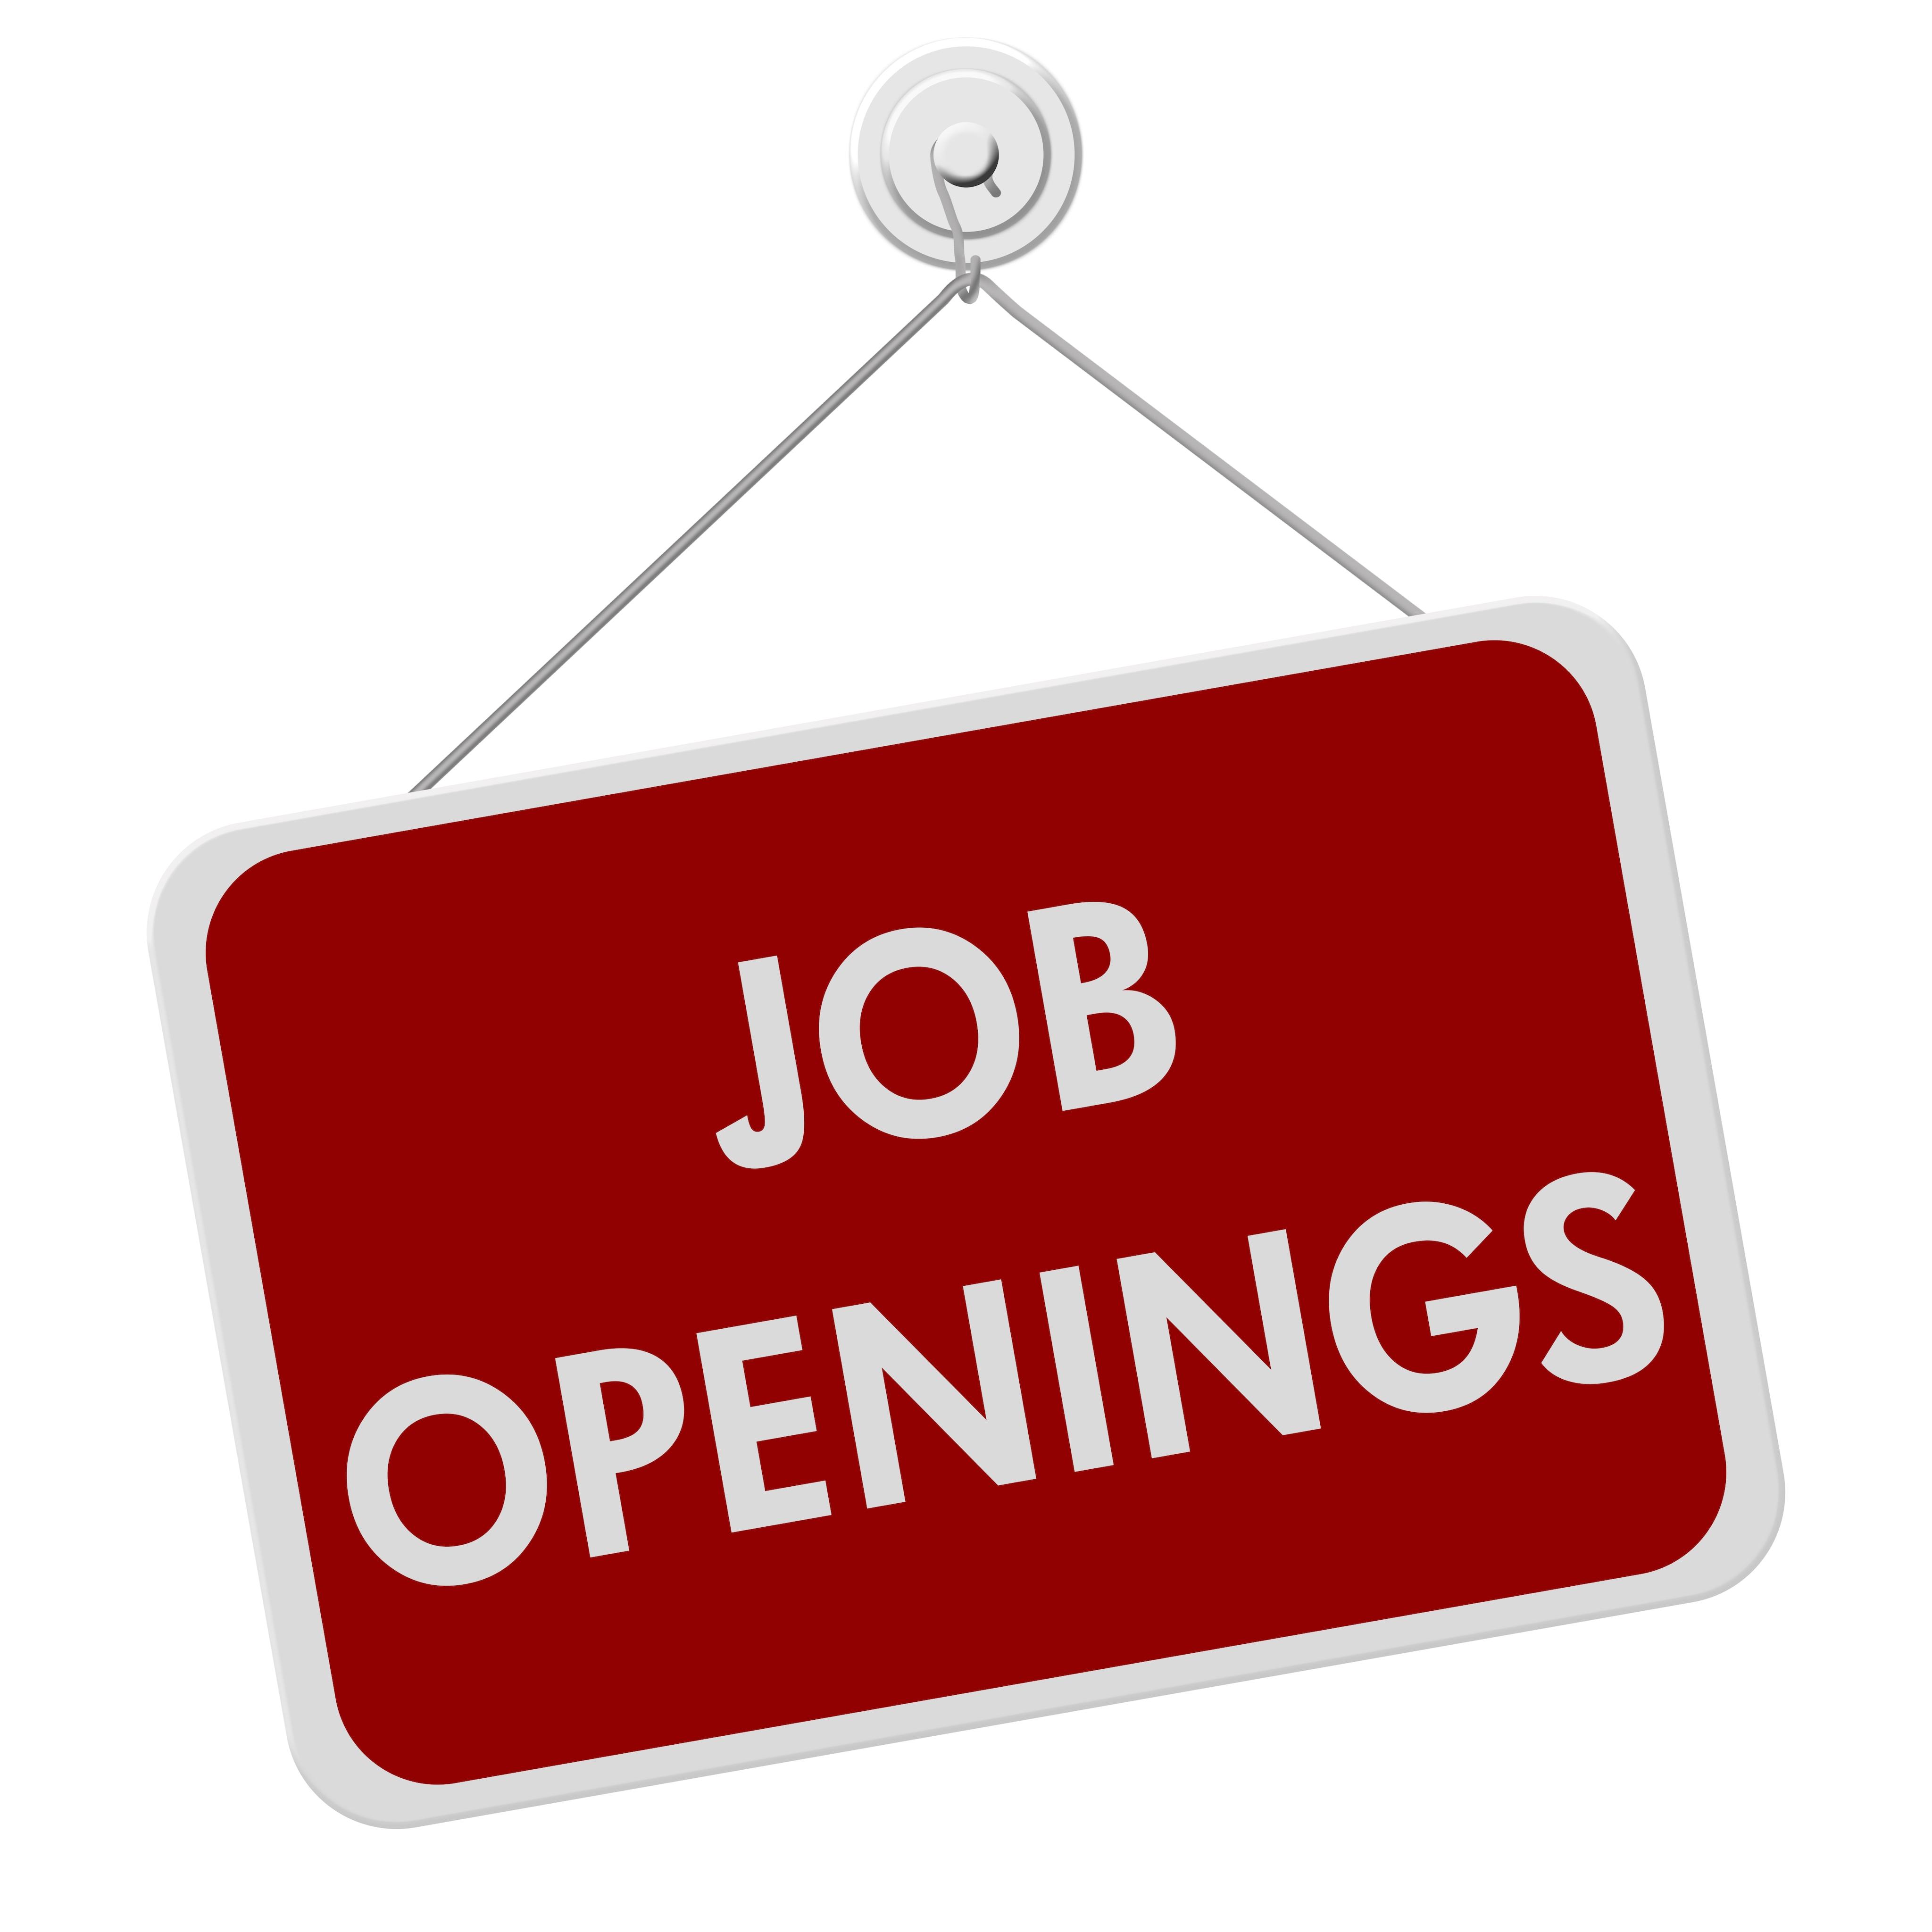 eastside kia new kia dealership in calgary ab te n employment opportunities